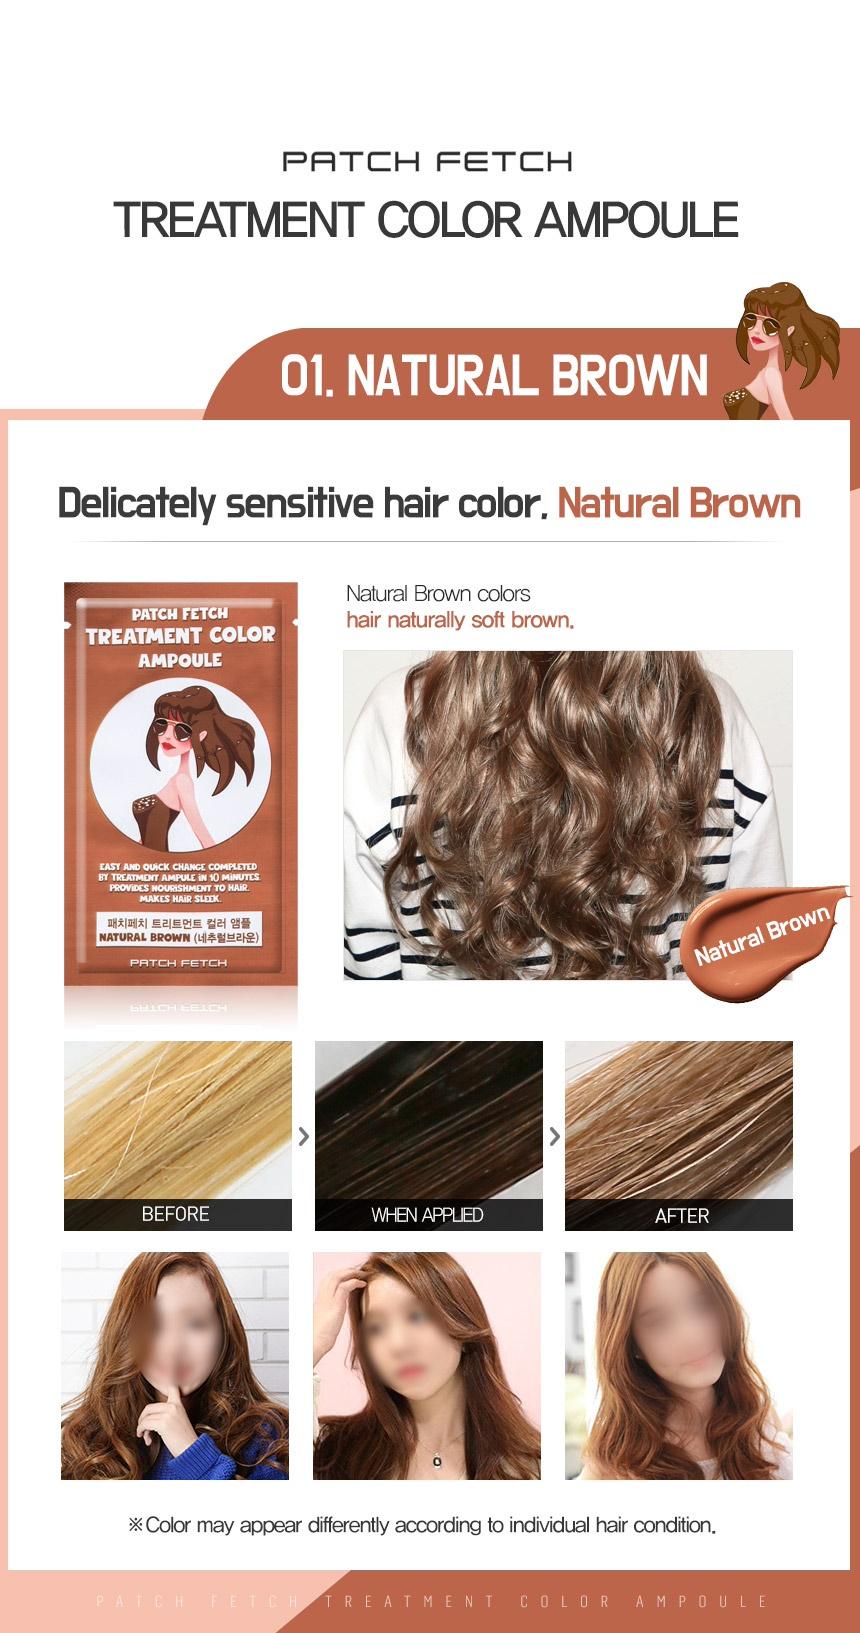 Buy Buy 1 Get 1 Free11 Patch Fetch Hair Color Treatment Ampoule